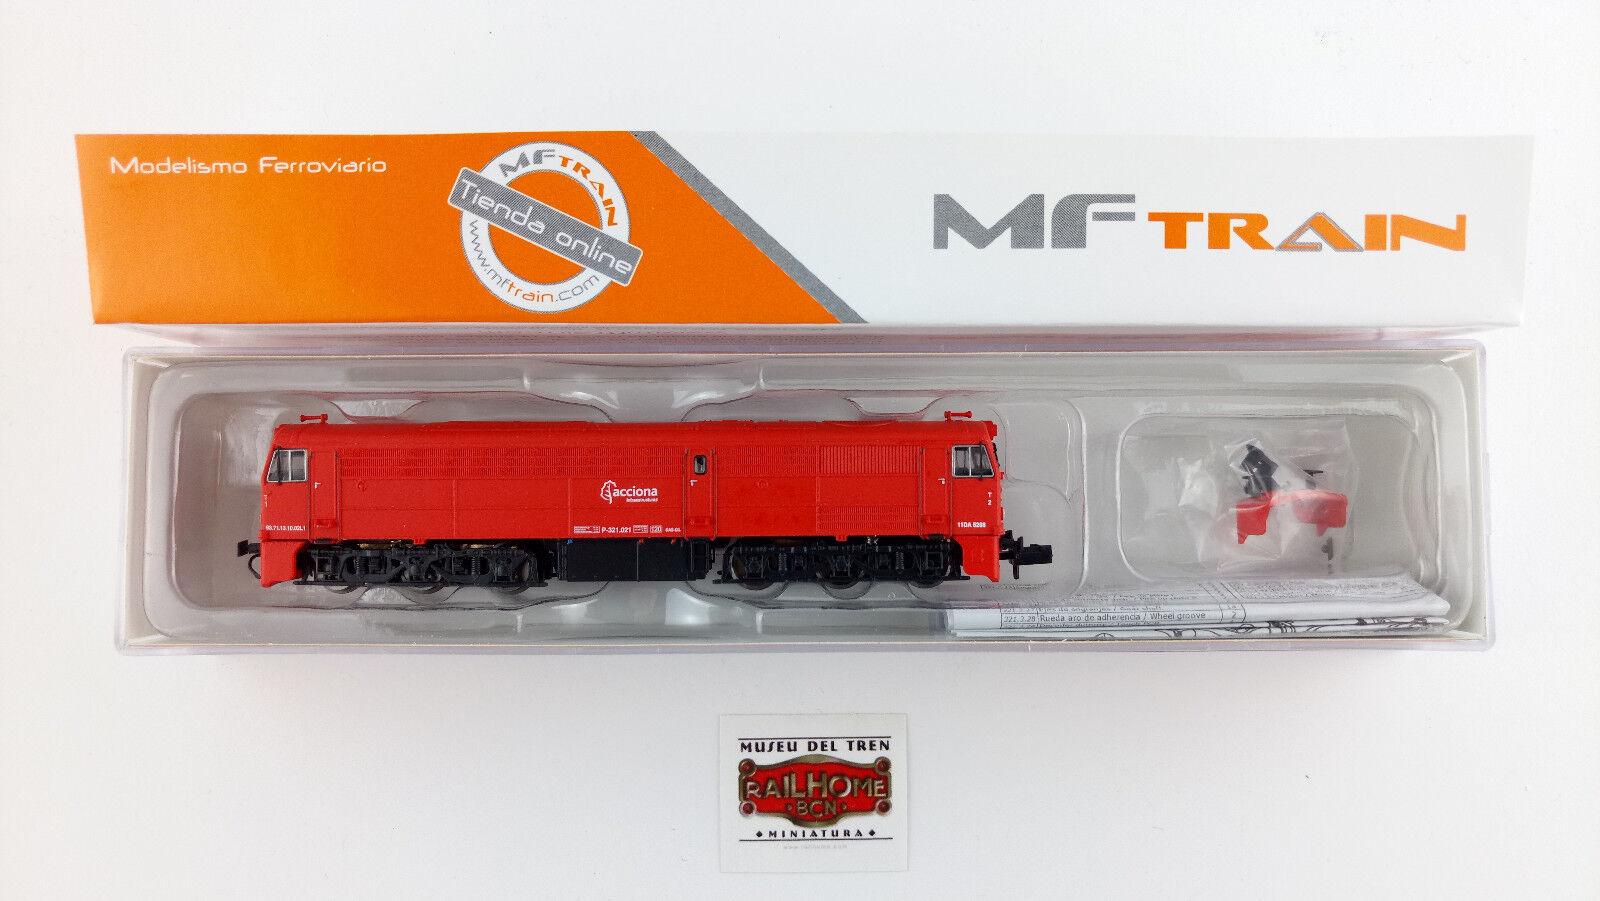 MFTRAIN N13226 - DIESEL-LOK 321-021-1  ACCIONA RED  - - - NEW OVP - TOP 70945e